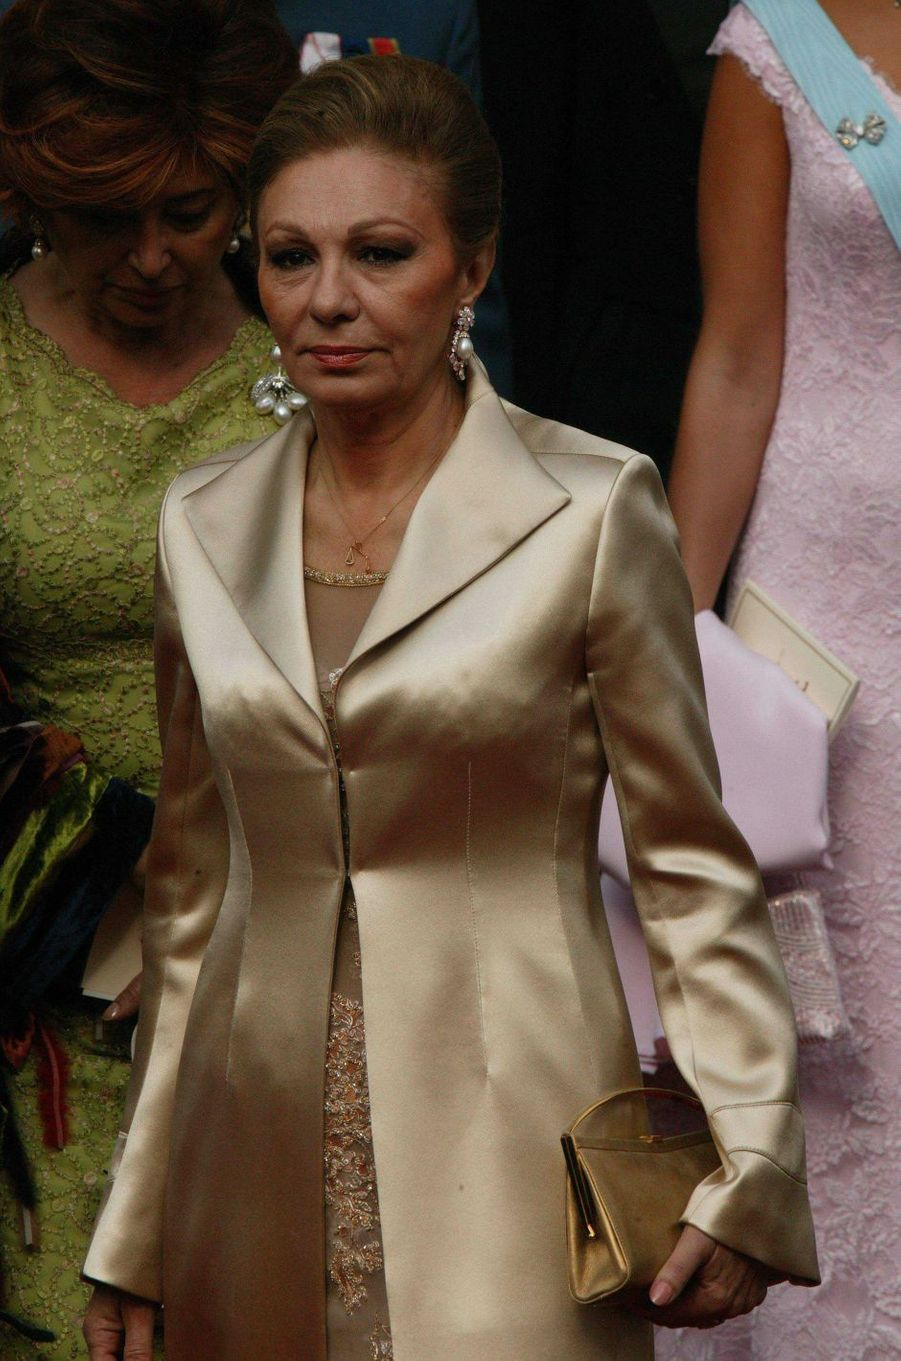 L'ancienne impératrice d'Iran Farah Diba à Copenhague, le 14 mai 2004